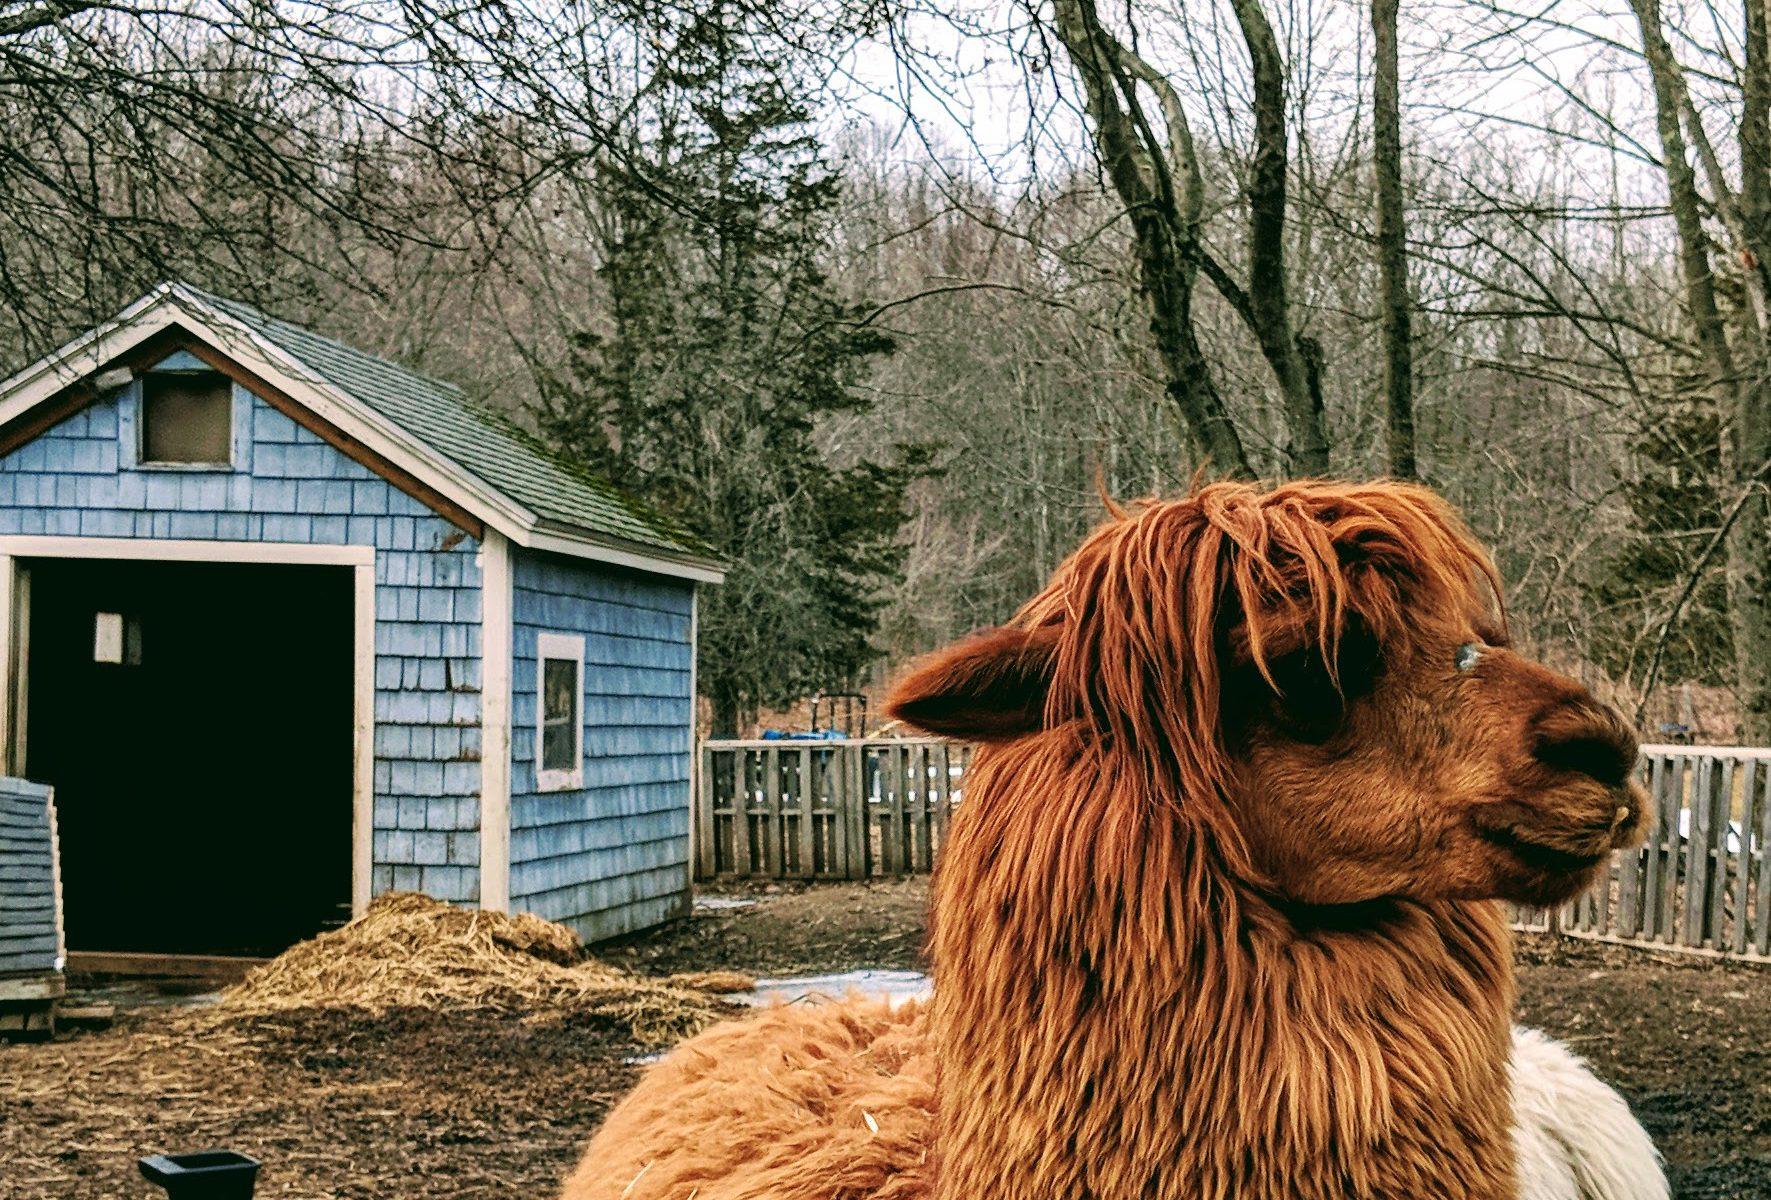 Zeva barnyard winter